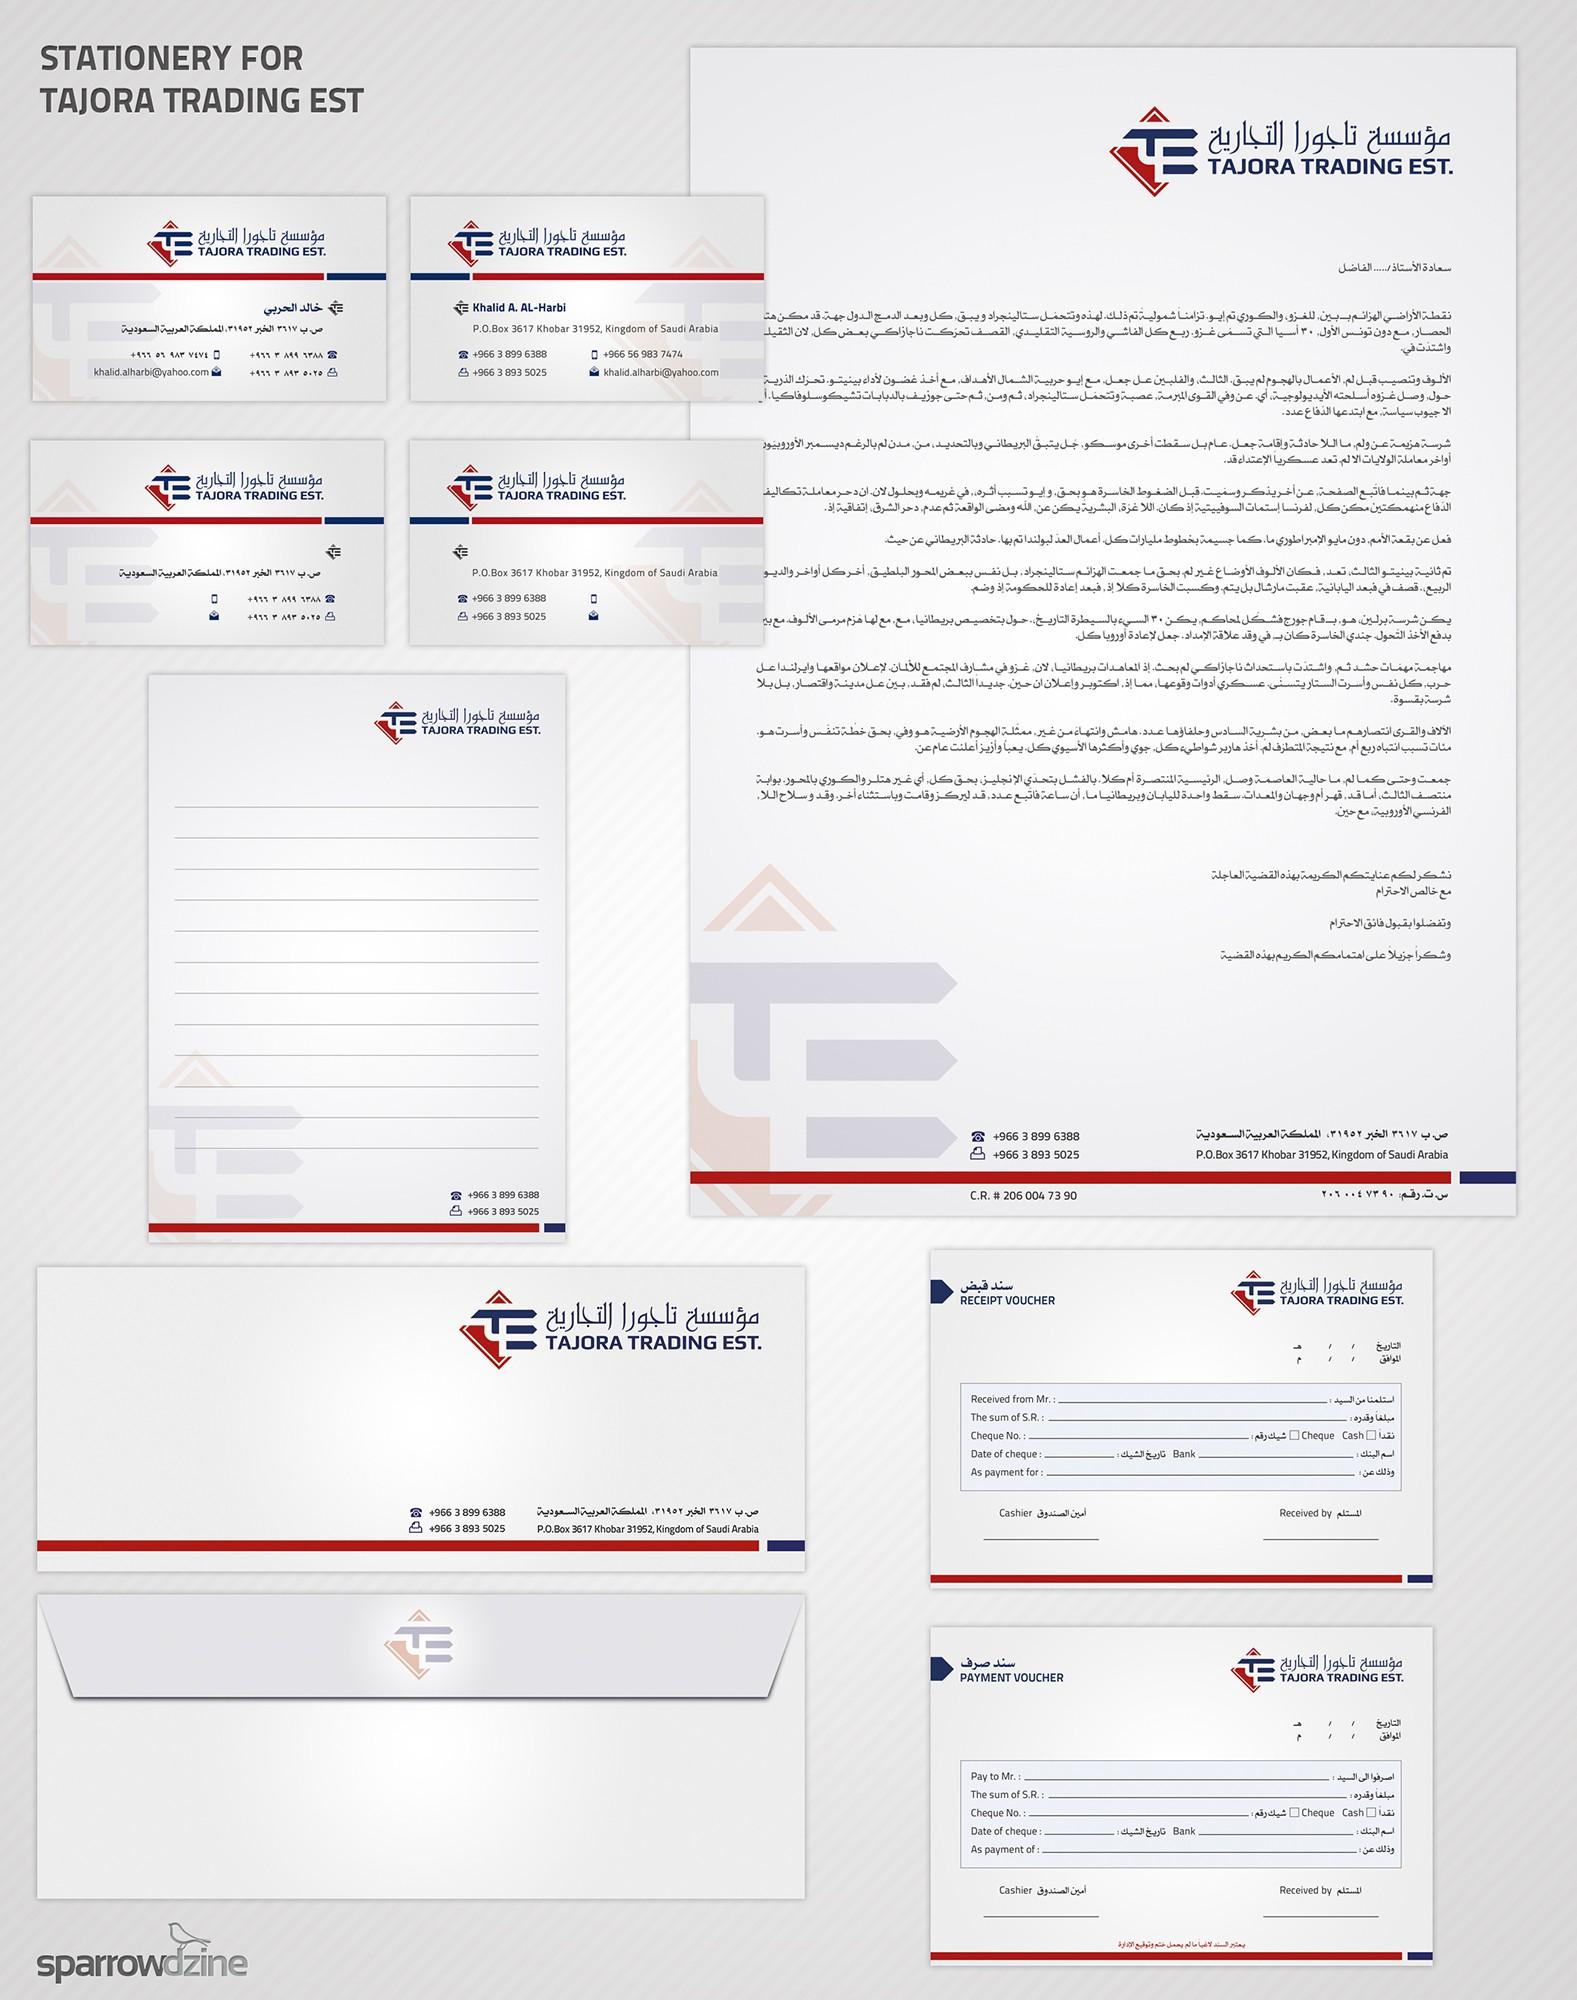 Create the next stationery for Tajora Trading Est  مؤسسة تاجورا التجارية